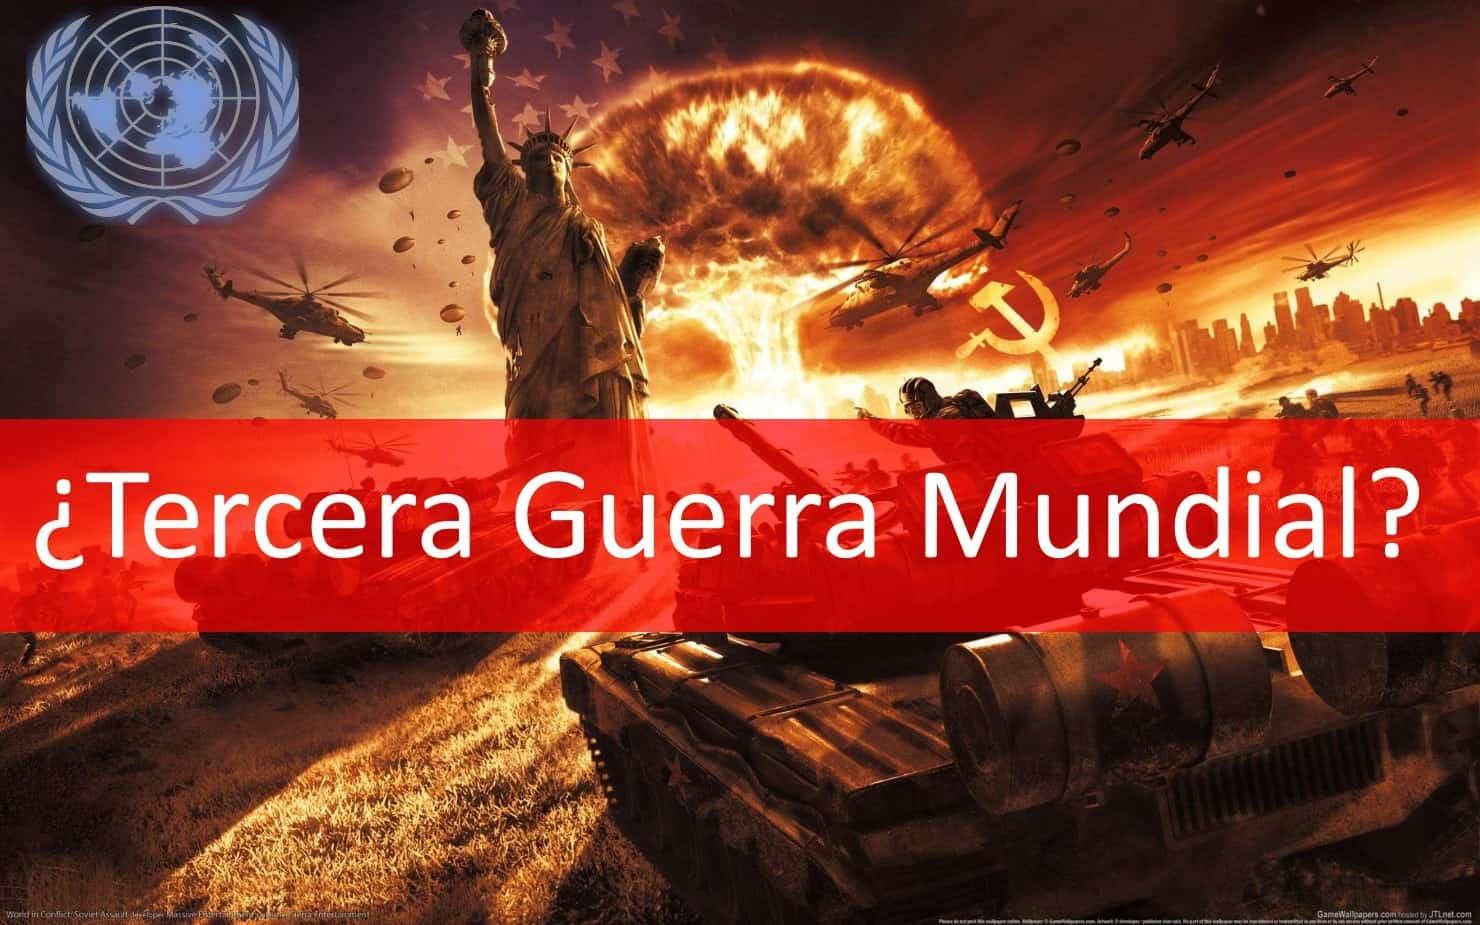 Tercera guerra mundial es inevitable